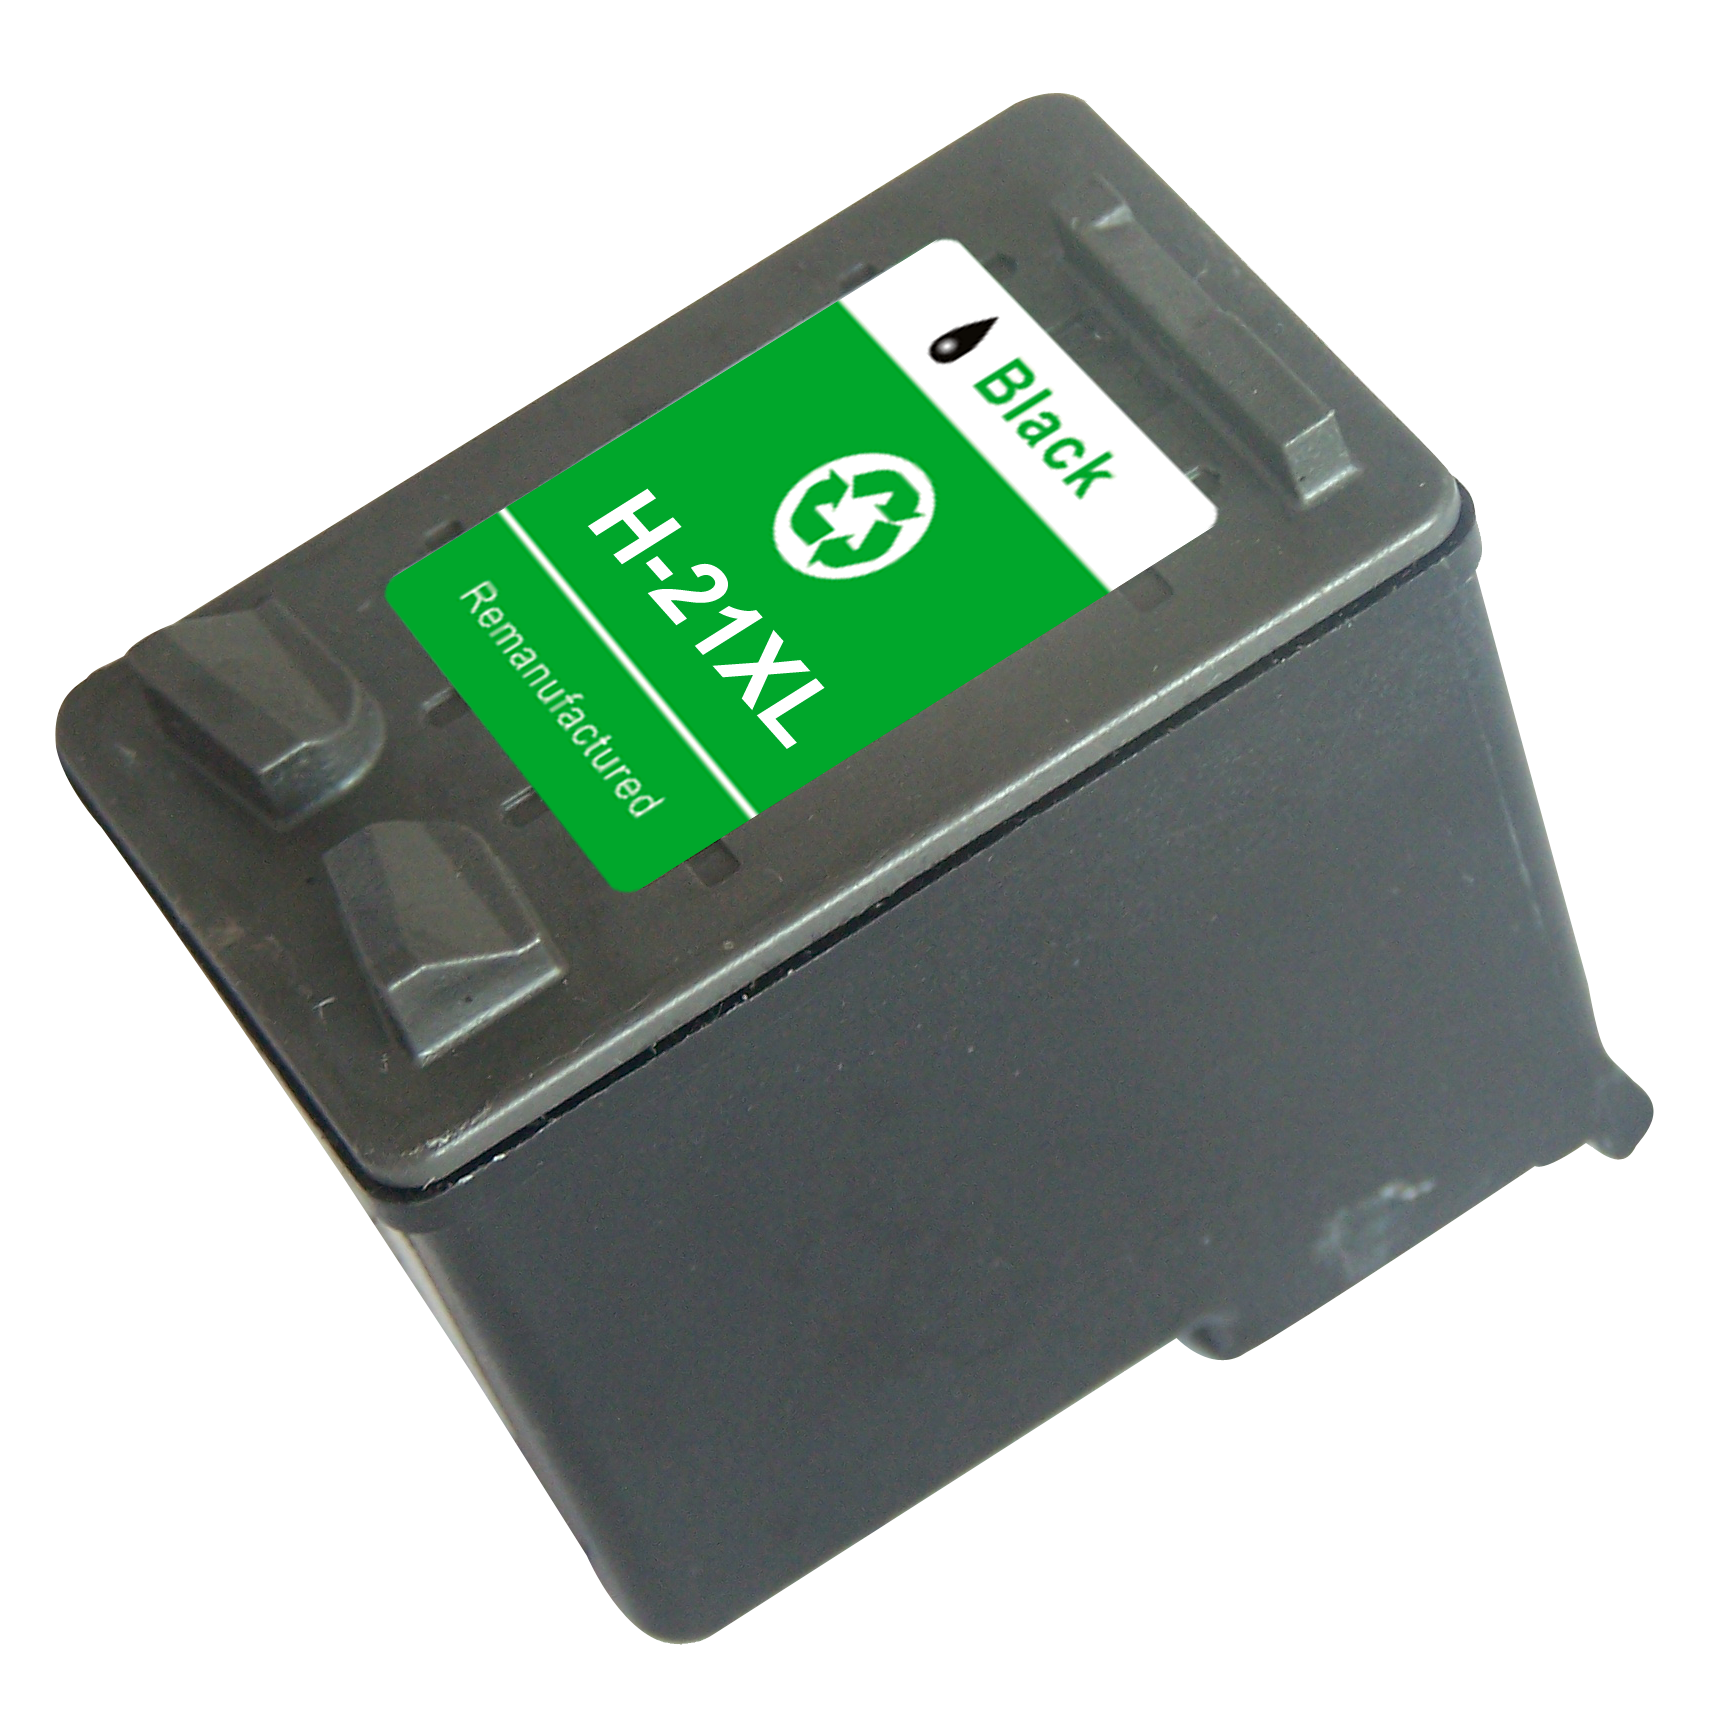 Reman Hewlett Packard C9351AE Inkjet